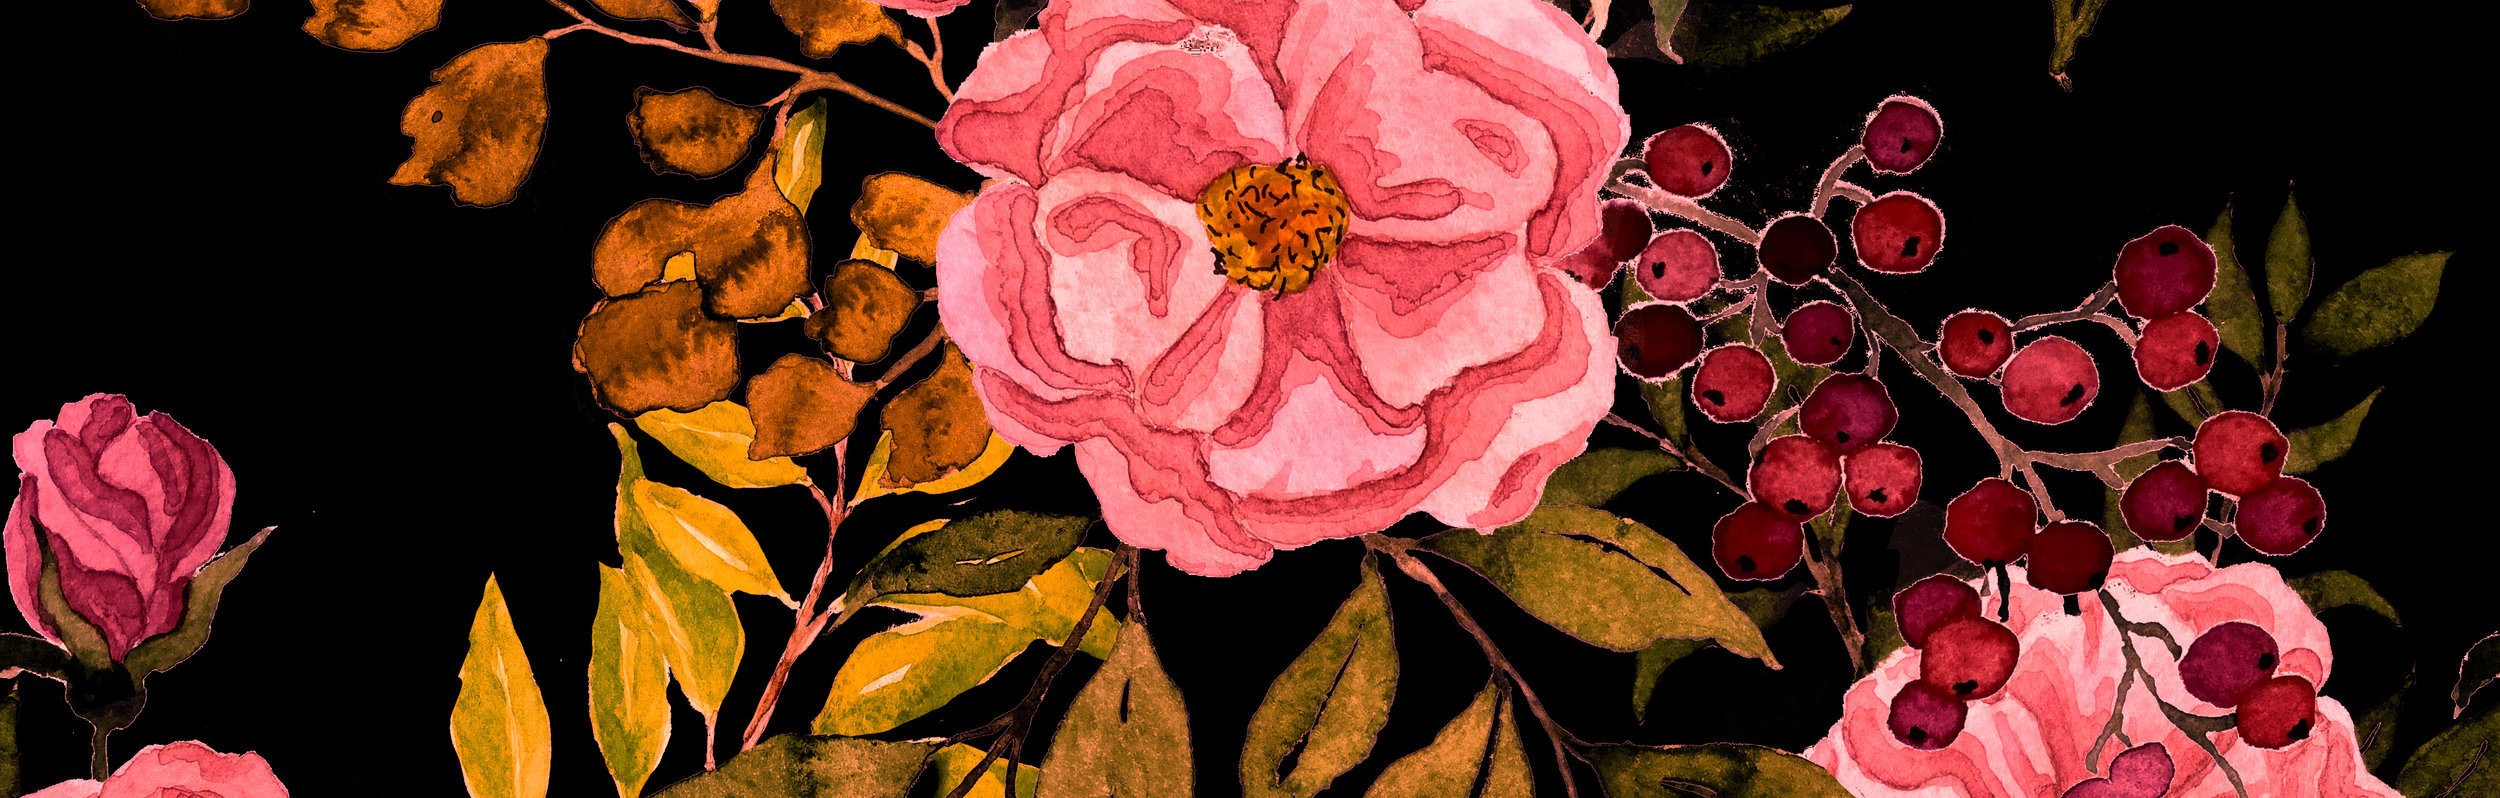 rosehips.jpg